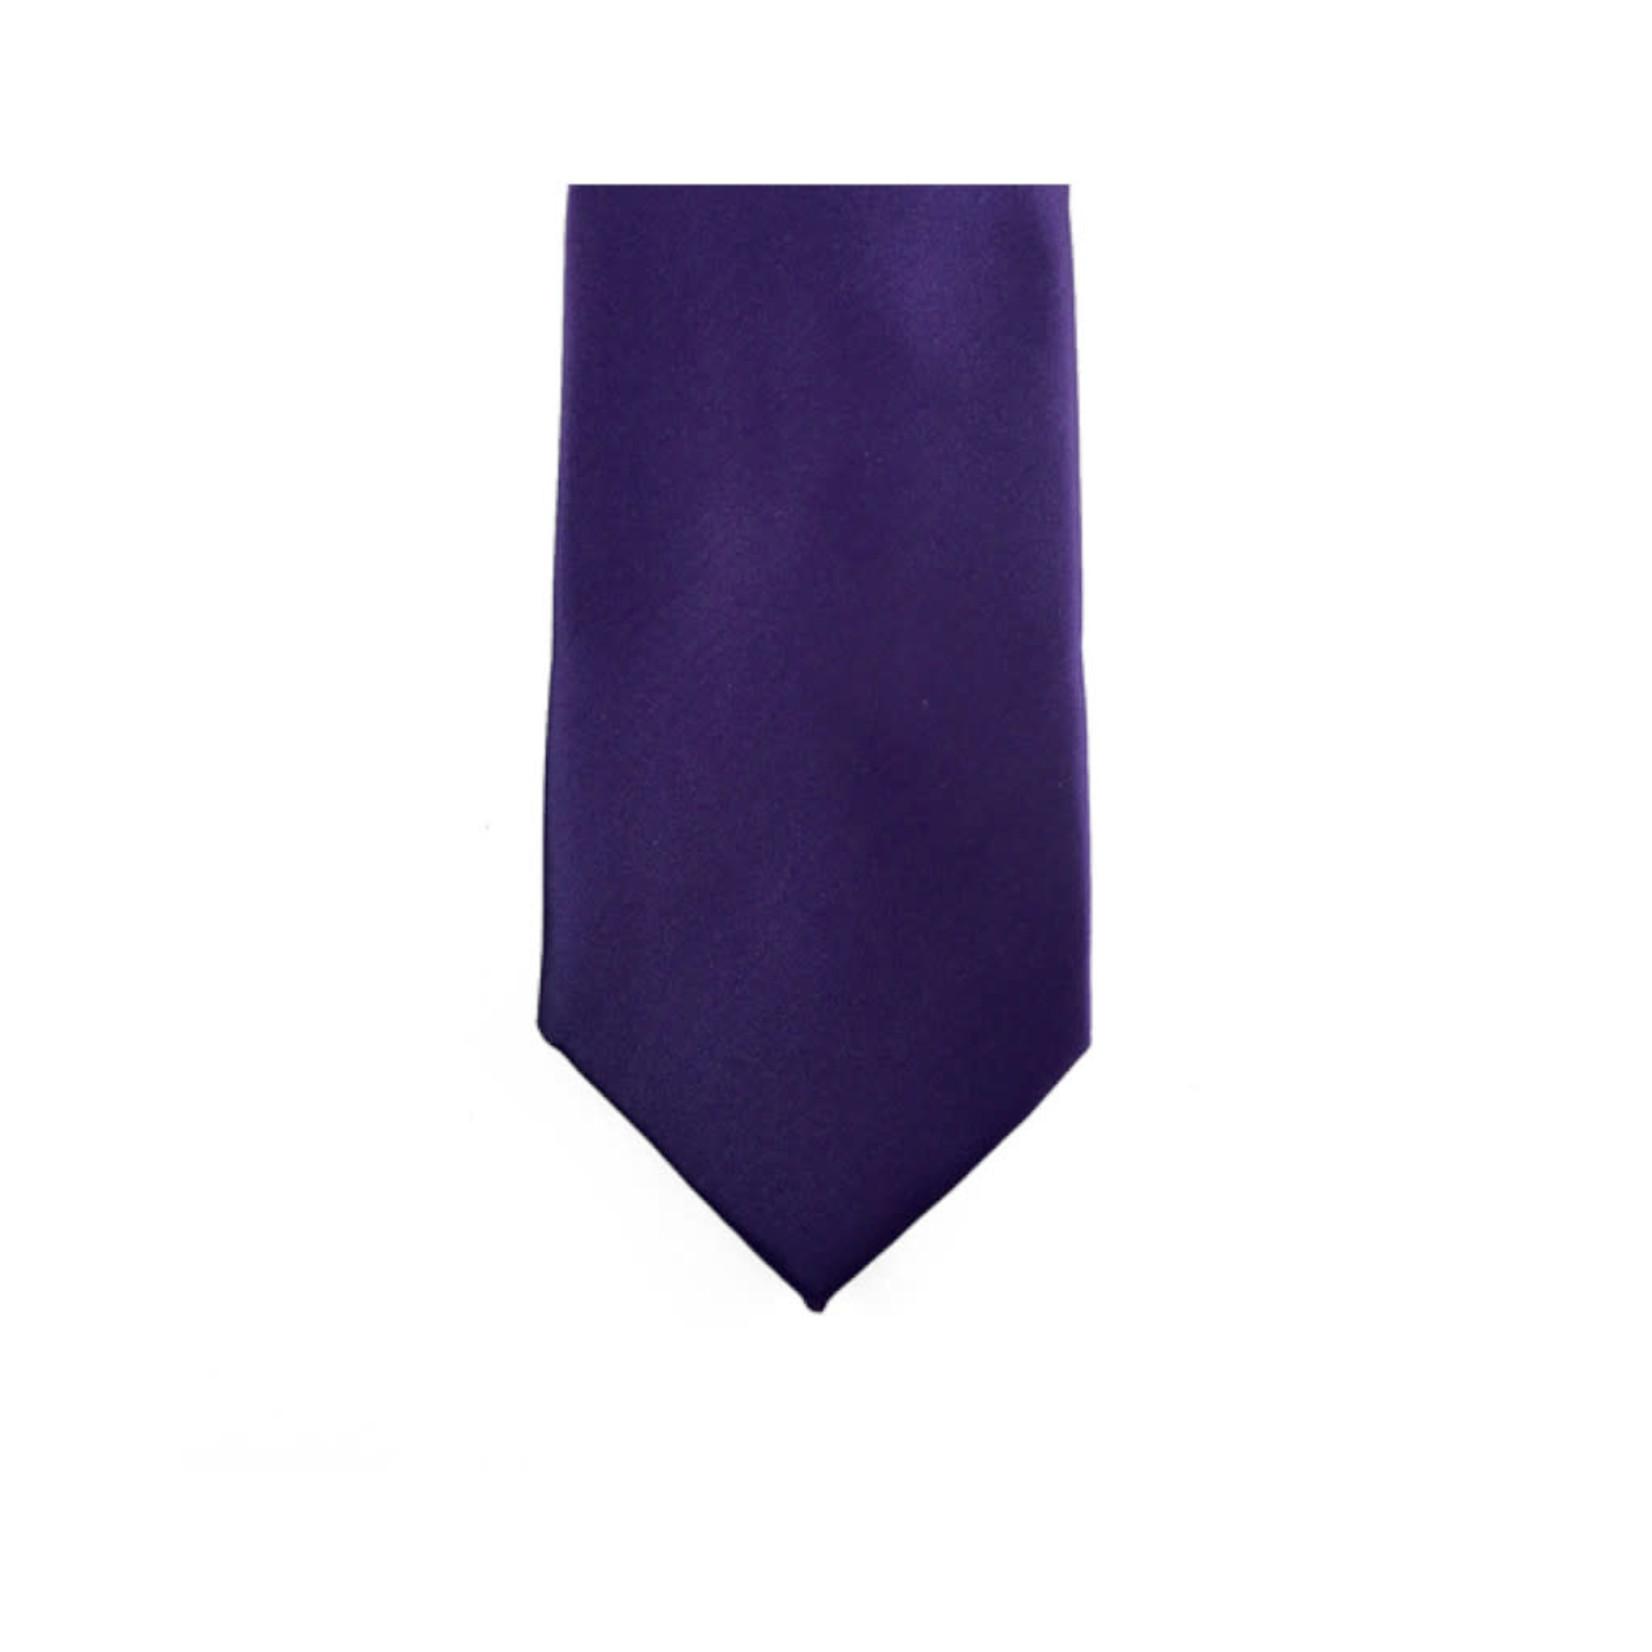 Knotz M100-35 Solid Purple Tie